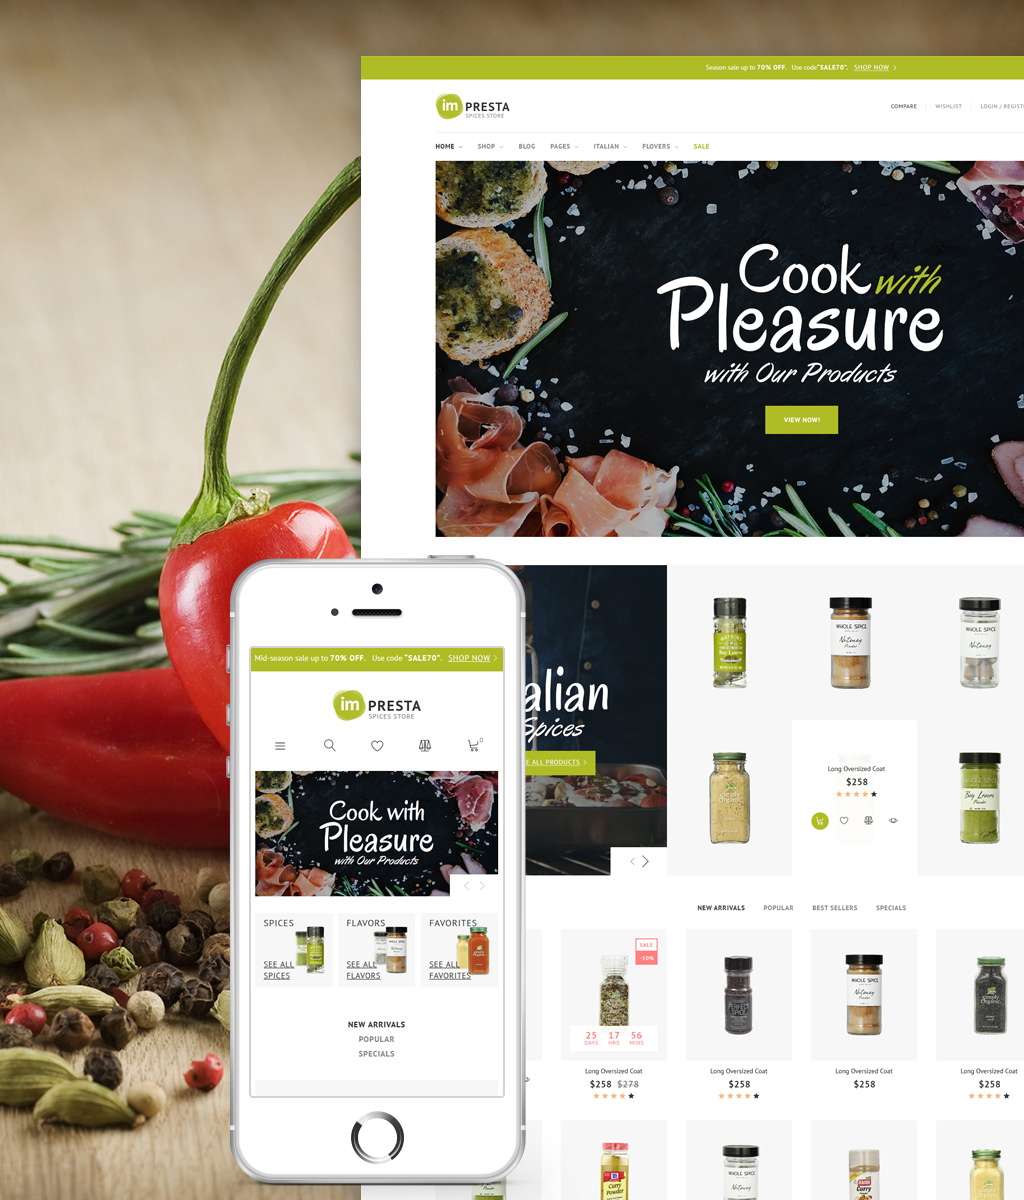 Impresta - Spices Store Tema PrestaShop №64388